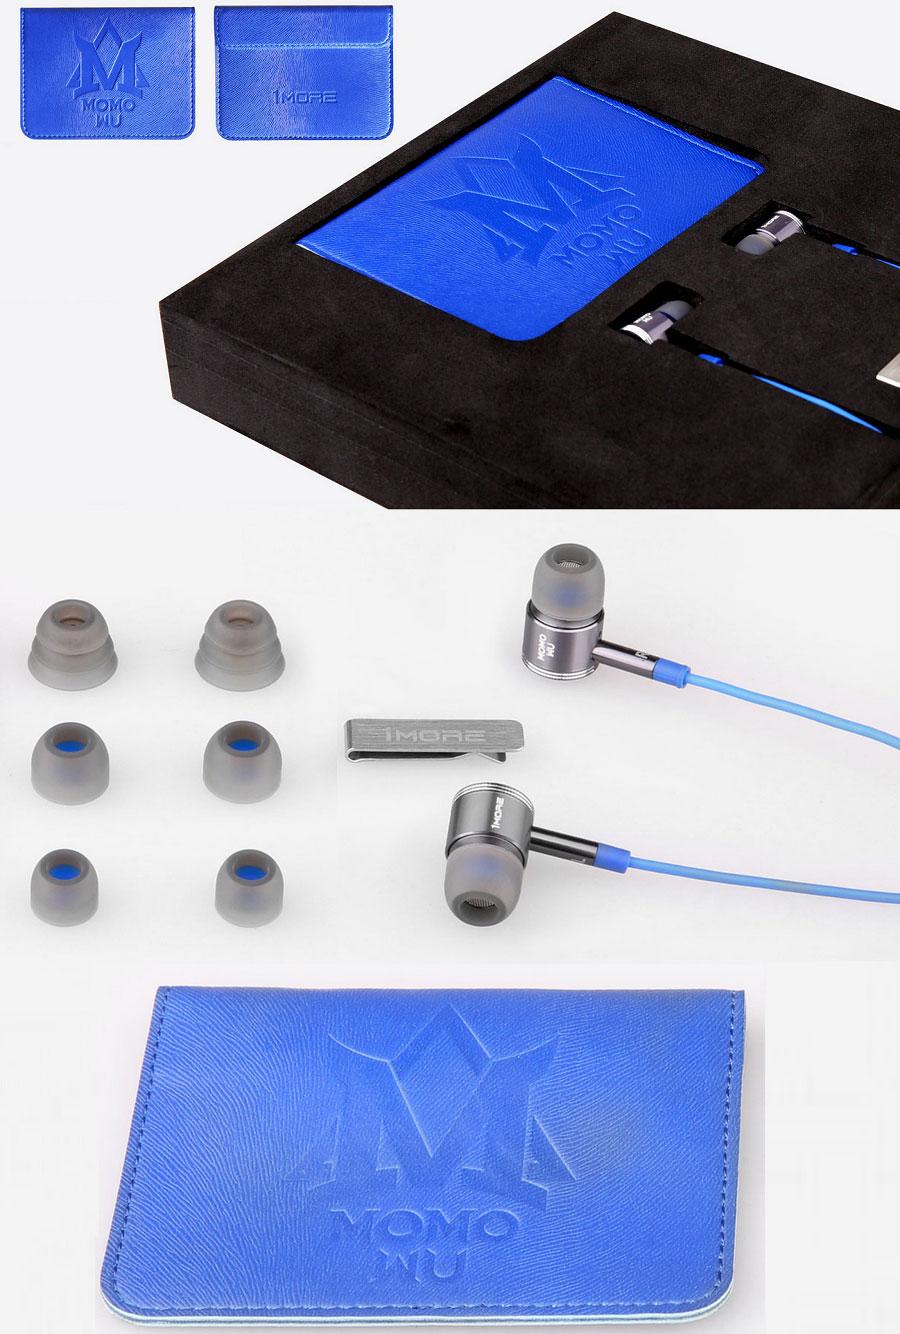 هندزفری شیائومی 1More MOMO In-Ear Headphones